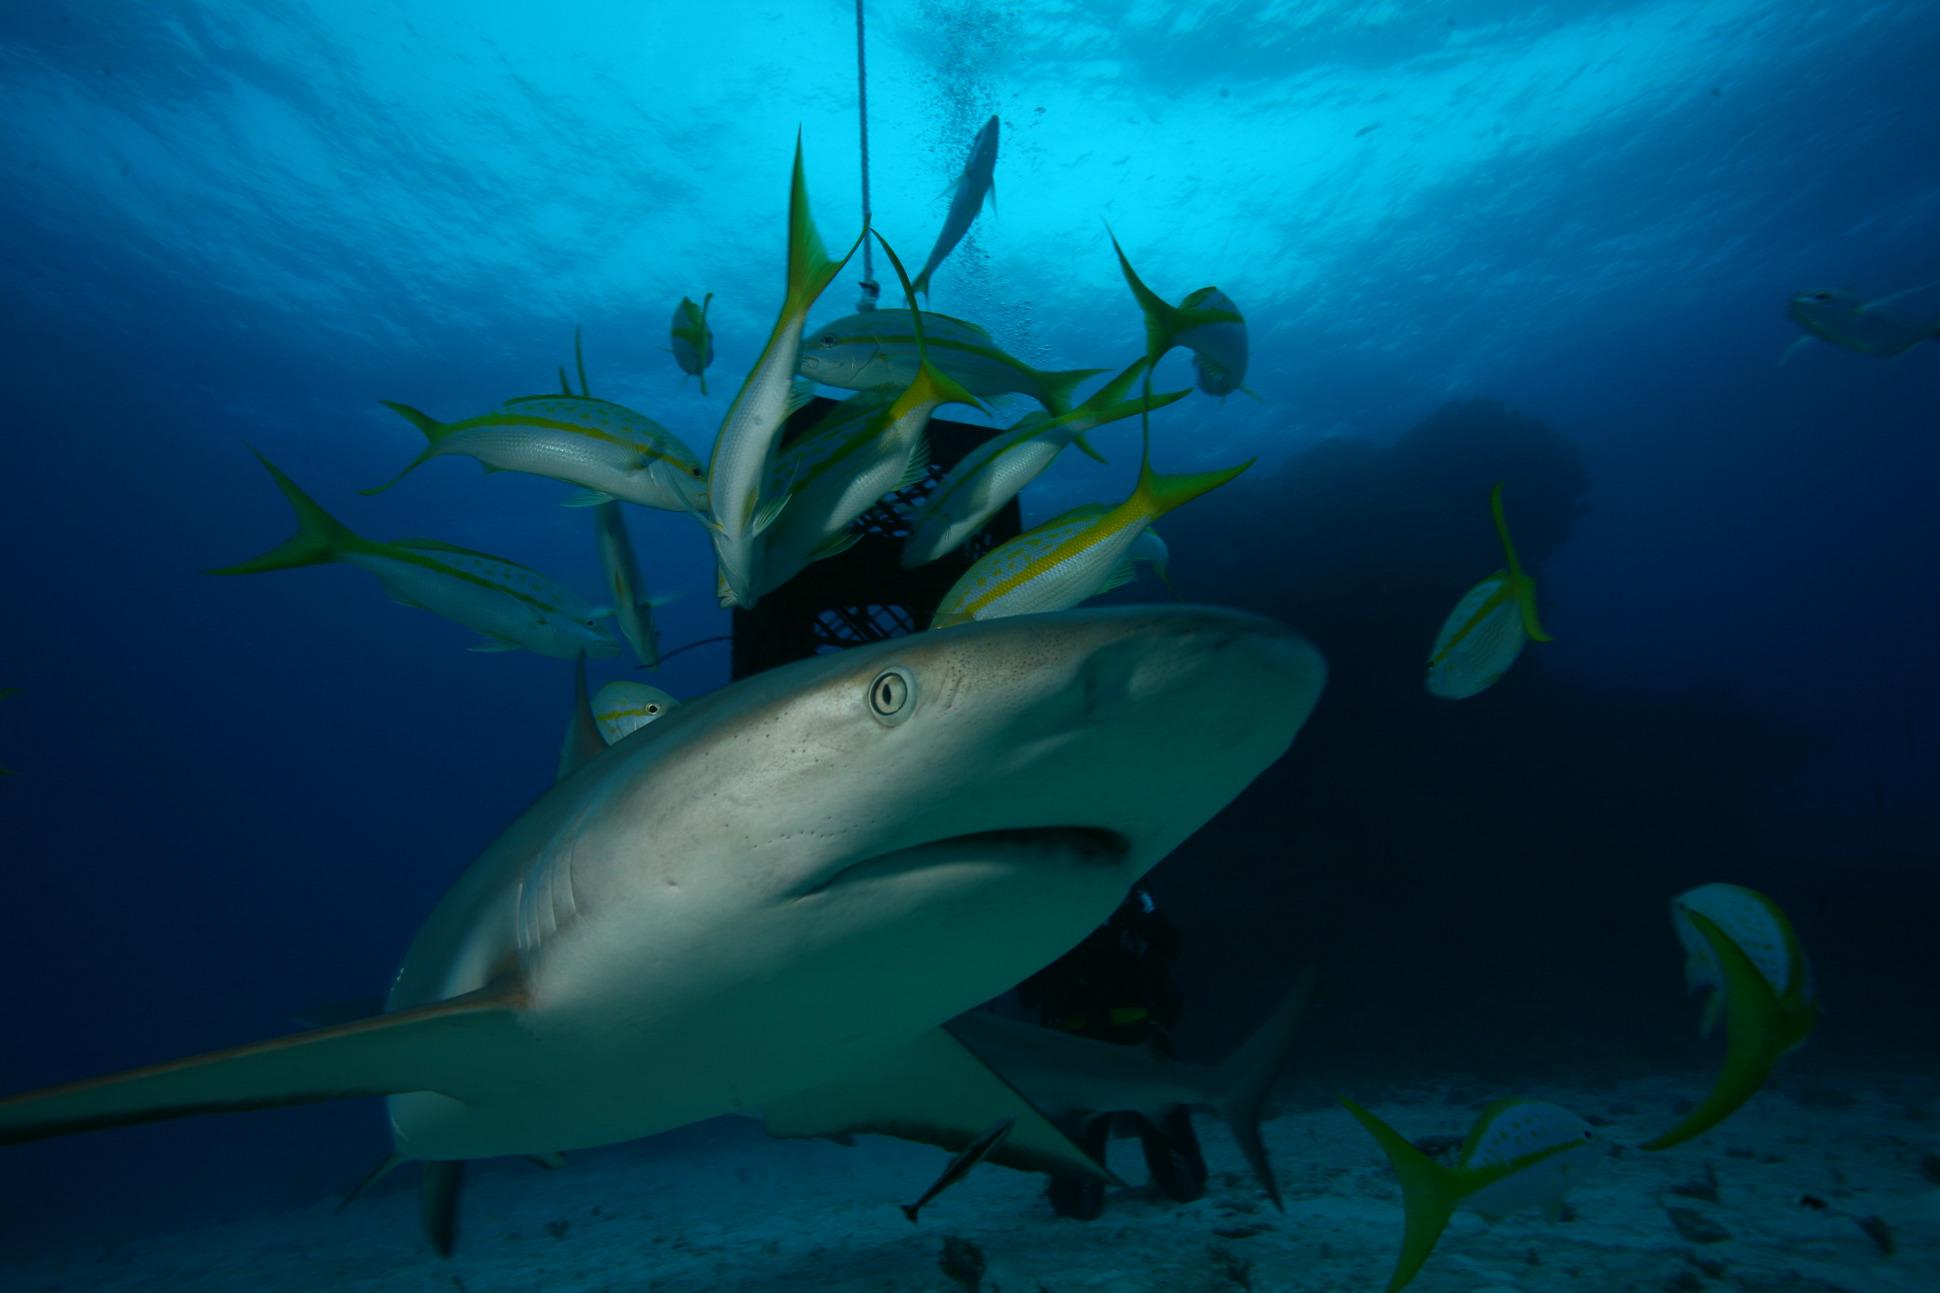 JBL Shark Workshop Bahamas 2018: Day 3 – The Shark Welcome